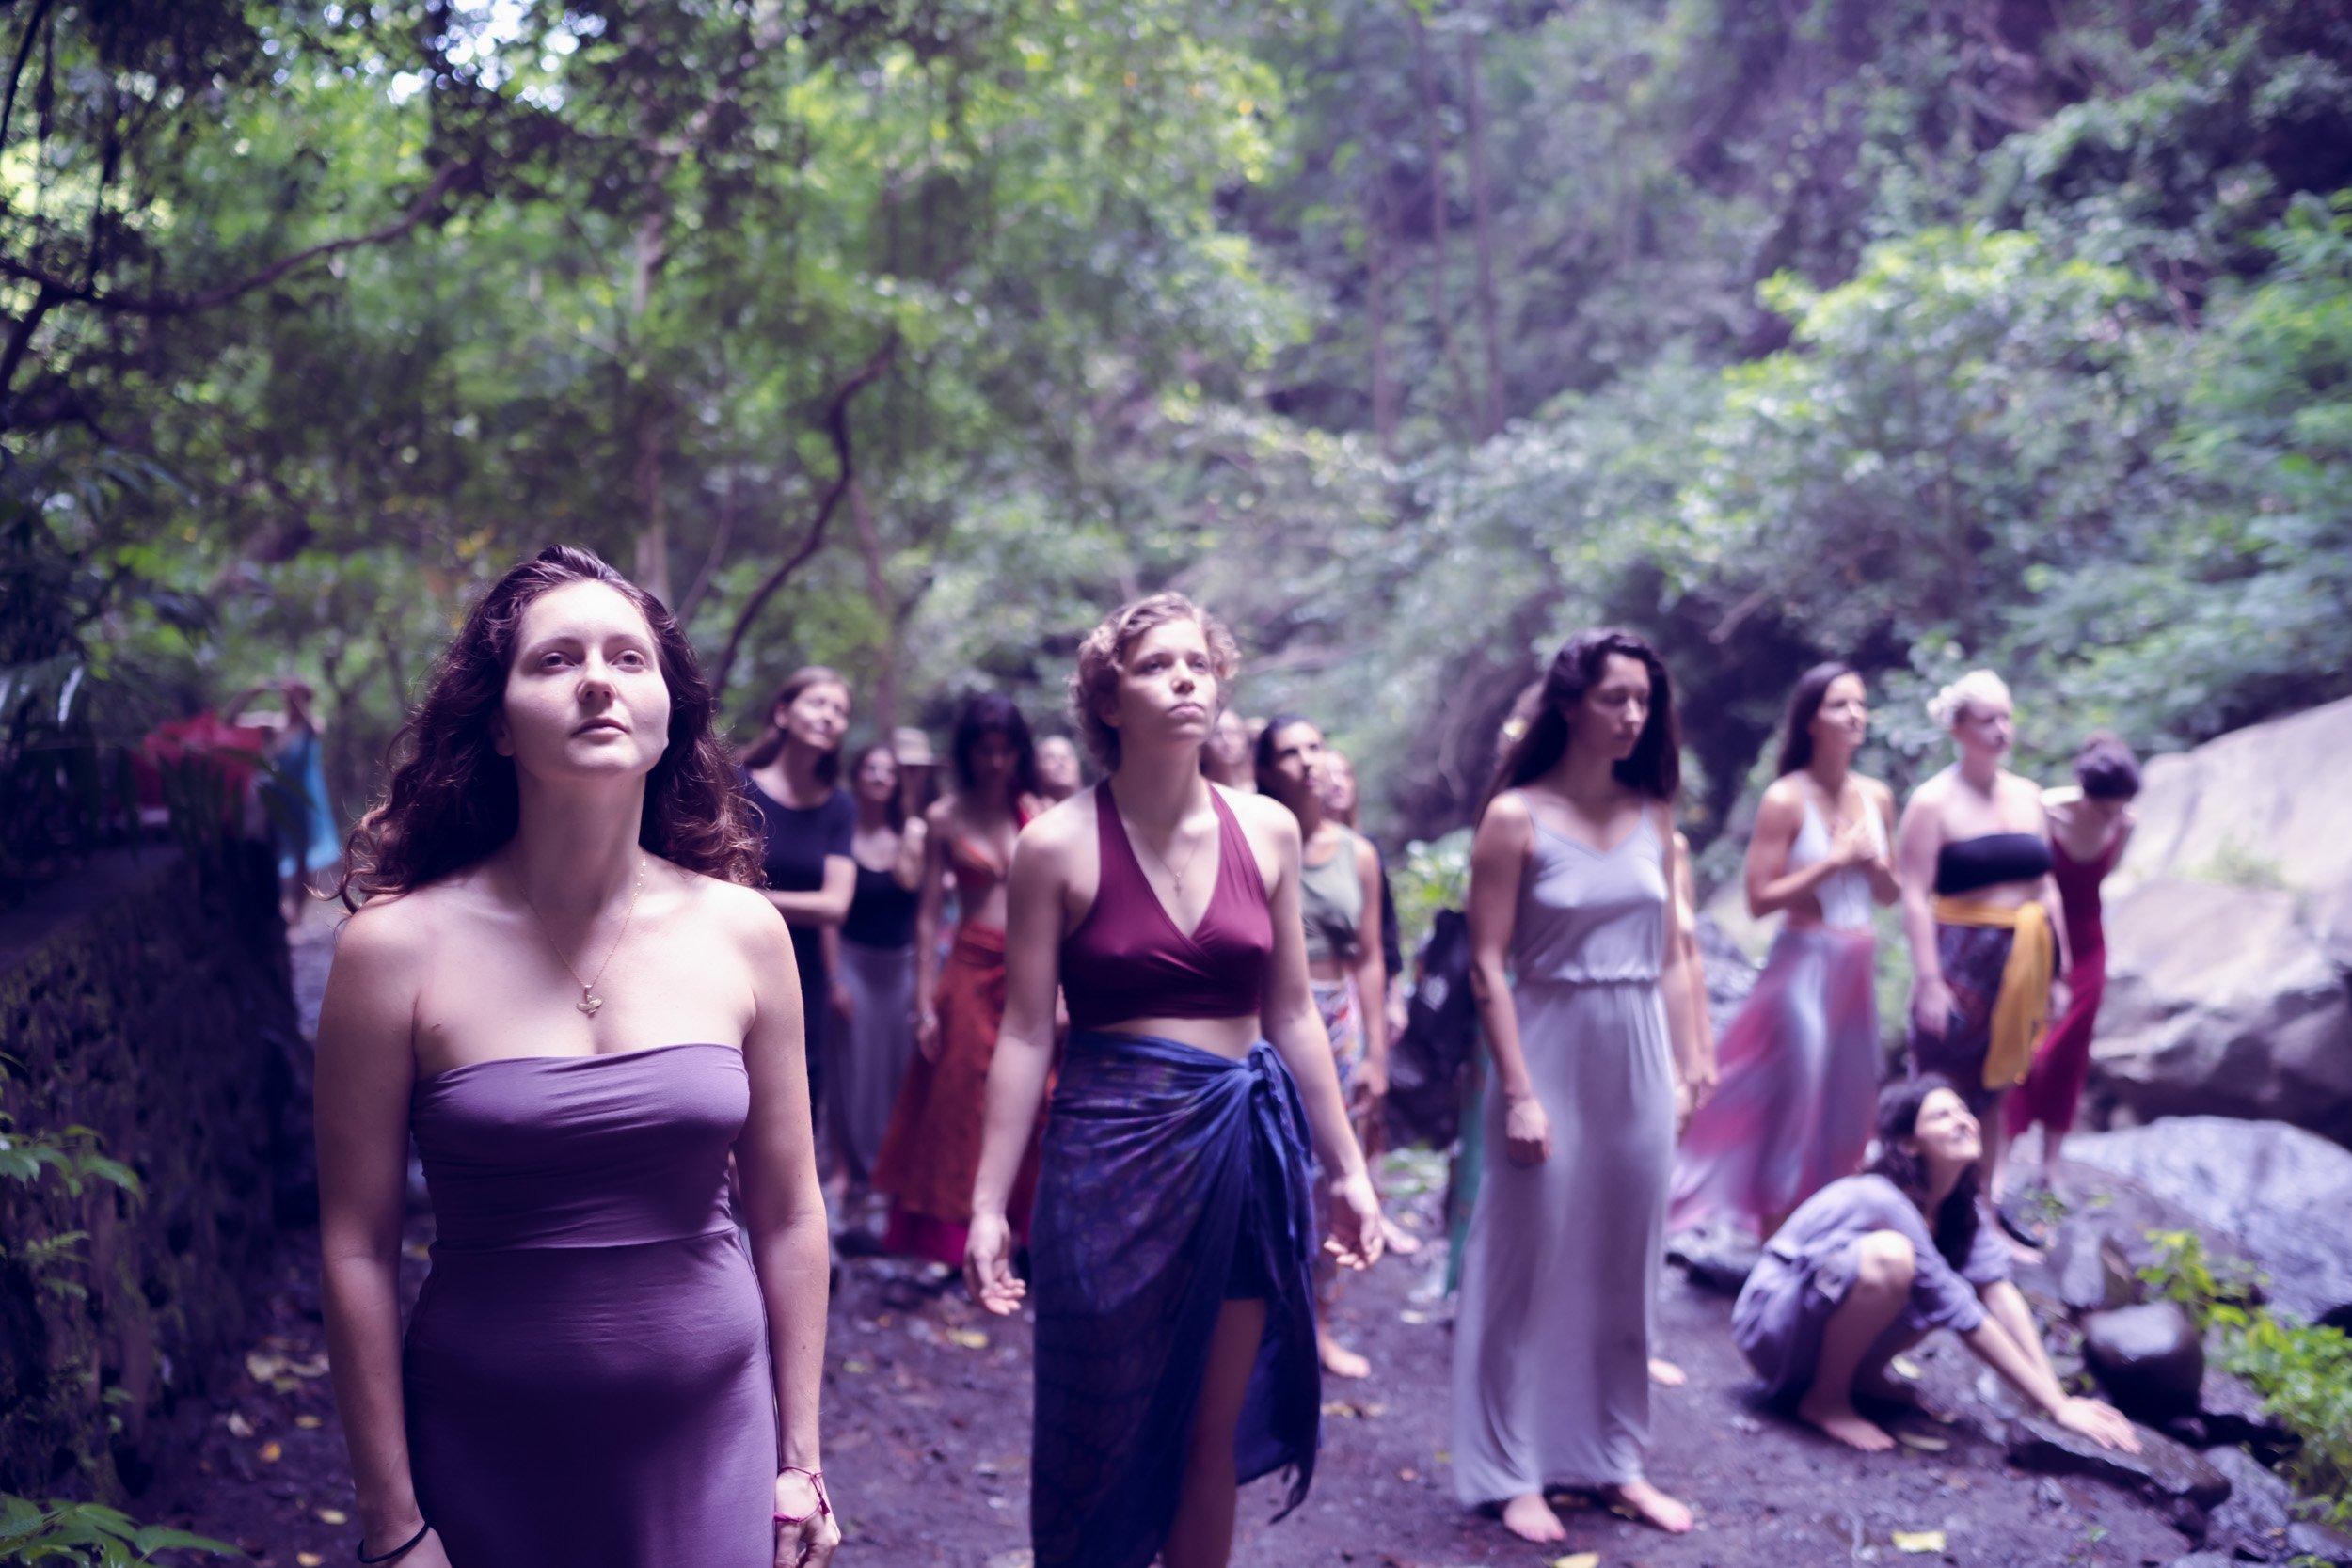 jodie-louise-photoshoots-films-videos-retreats-wrkshops-spiritual-yoga-33